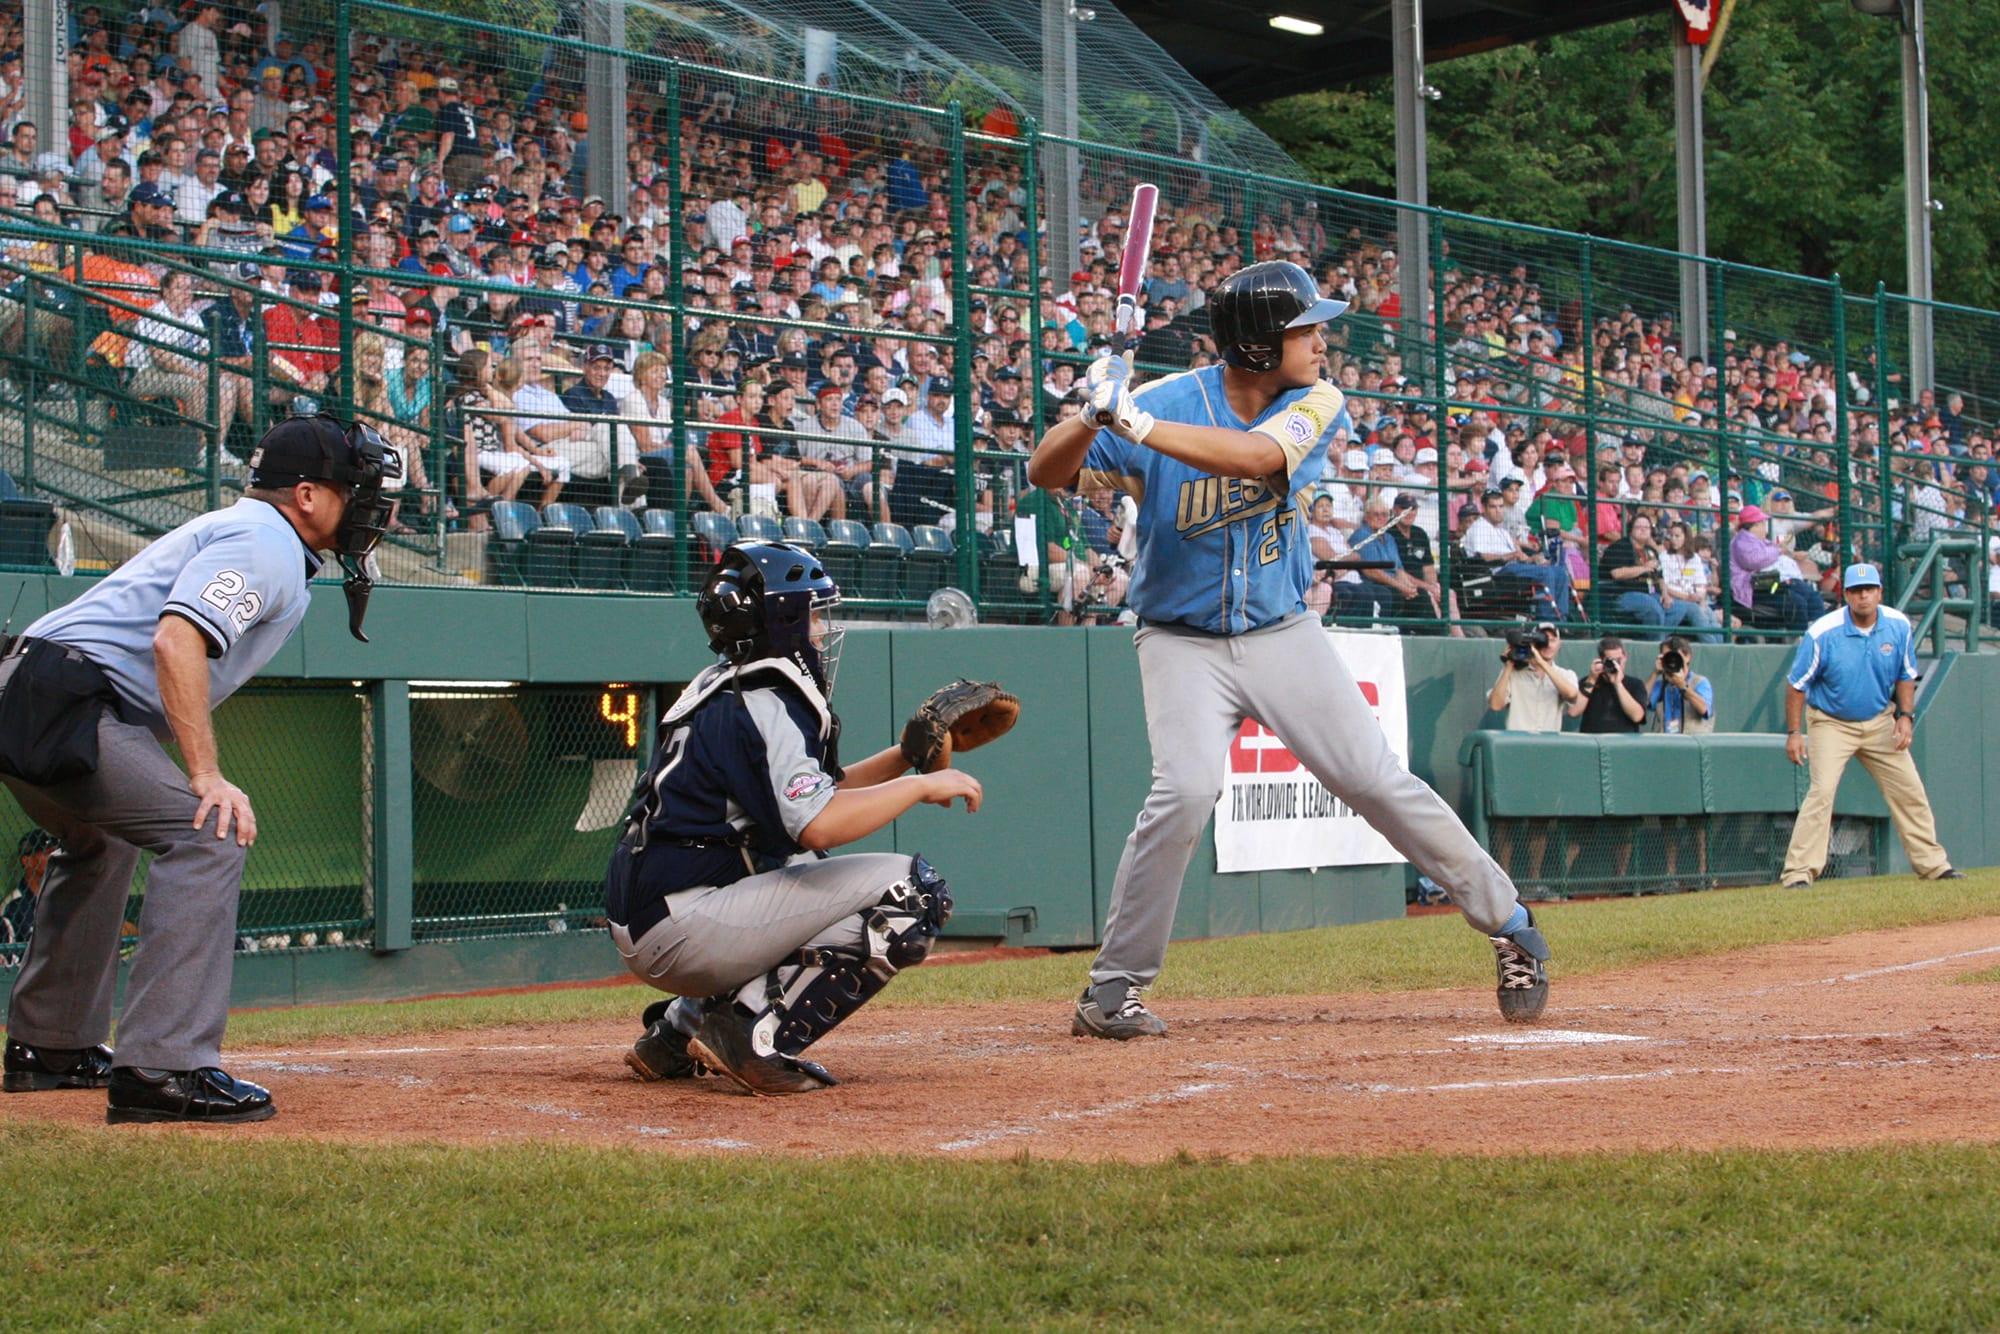 Luke Ramirez batting